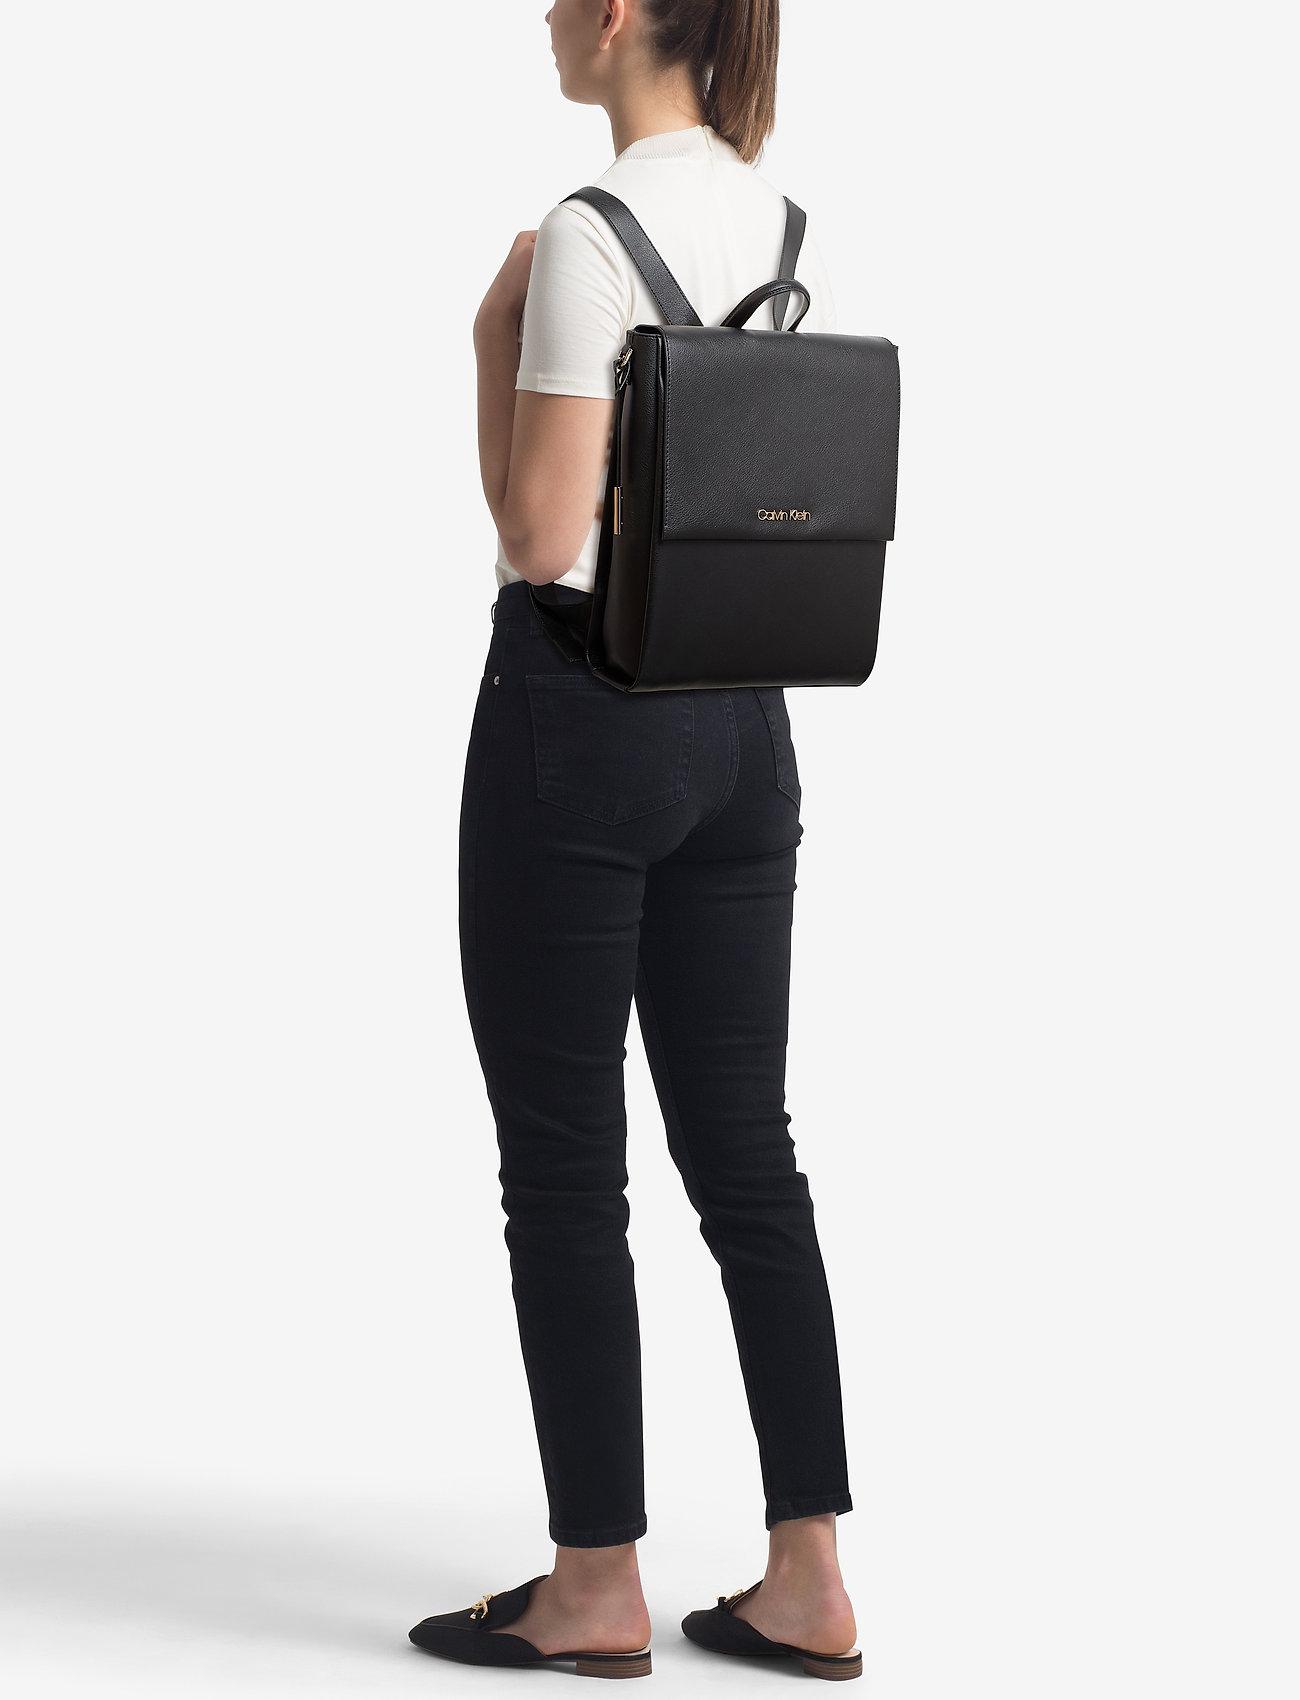 ebf8cf6232 Calvin Klein Avant Backpack (Black), (118.93 €) | Large selection of ...